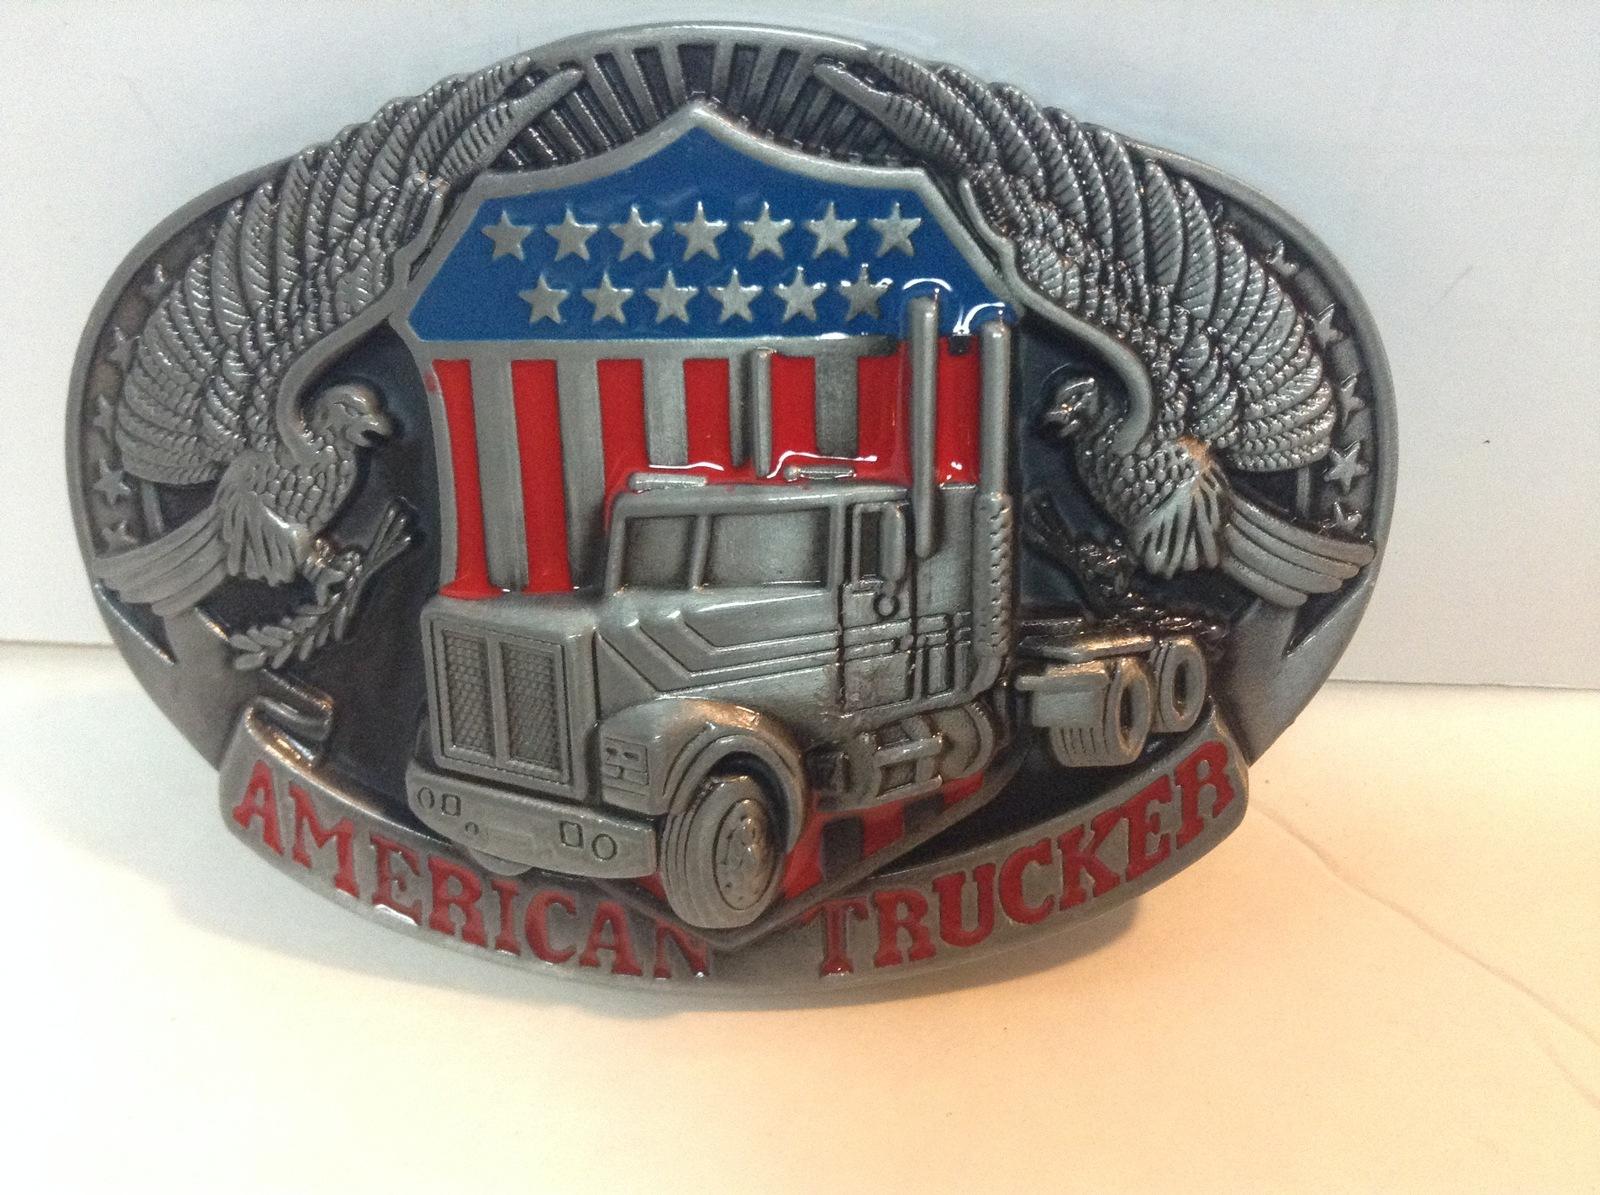 American Trucker Belt Buckle NEW Pewter Finish Patriotic Eagle